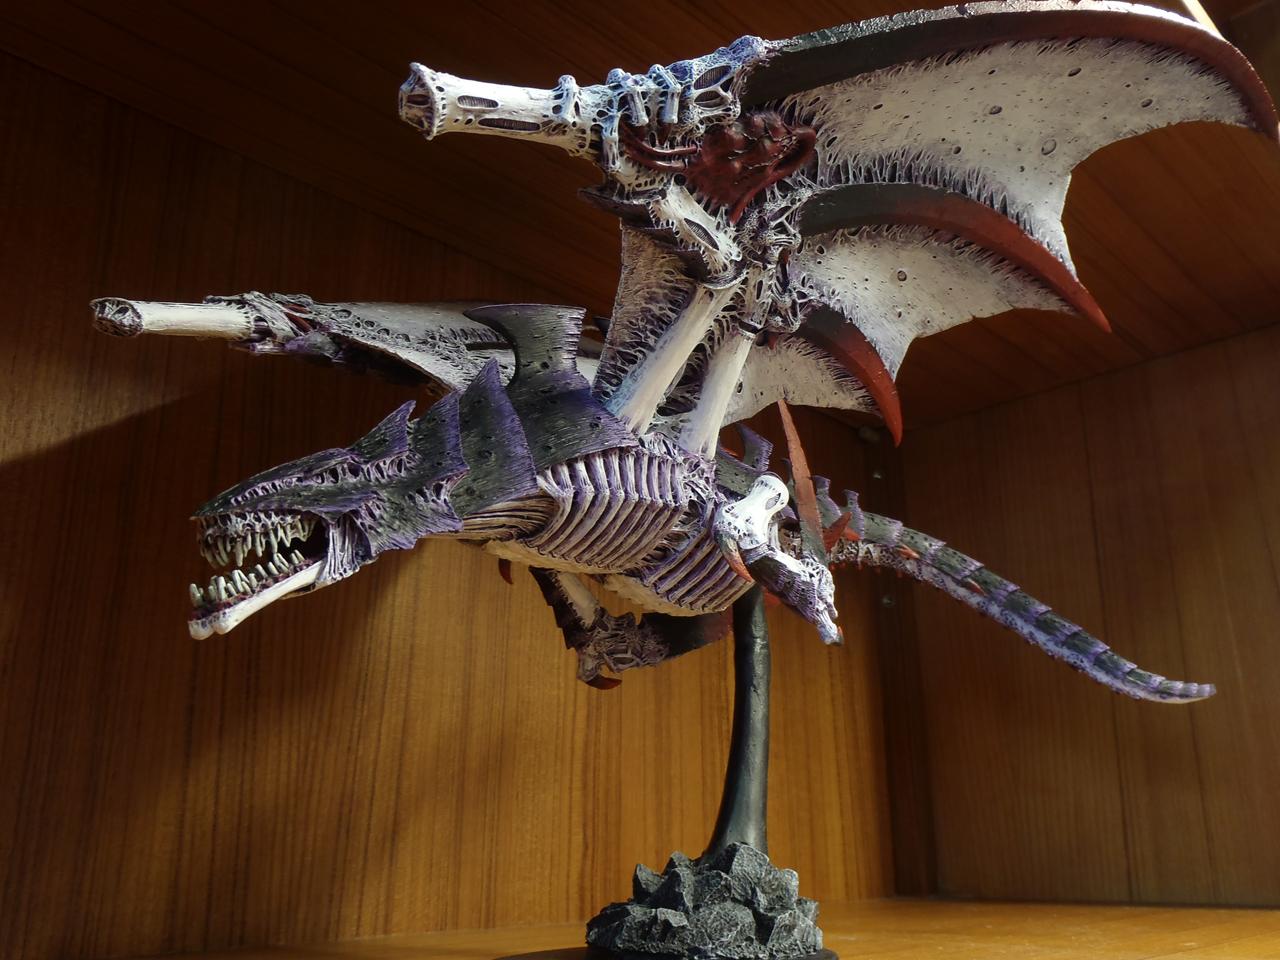 The Tyranid Harridan by DeathShadowSun